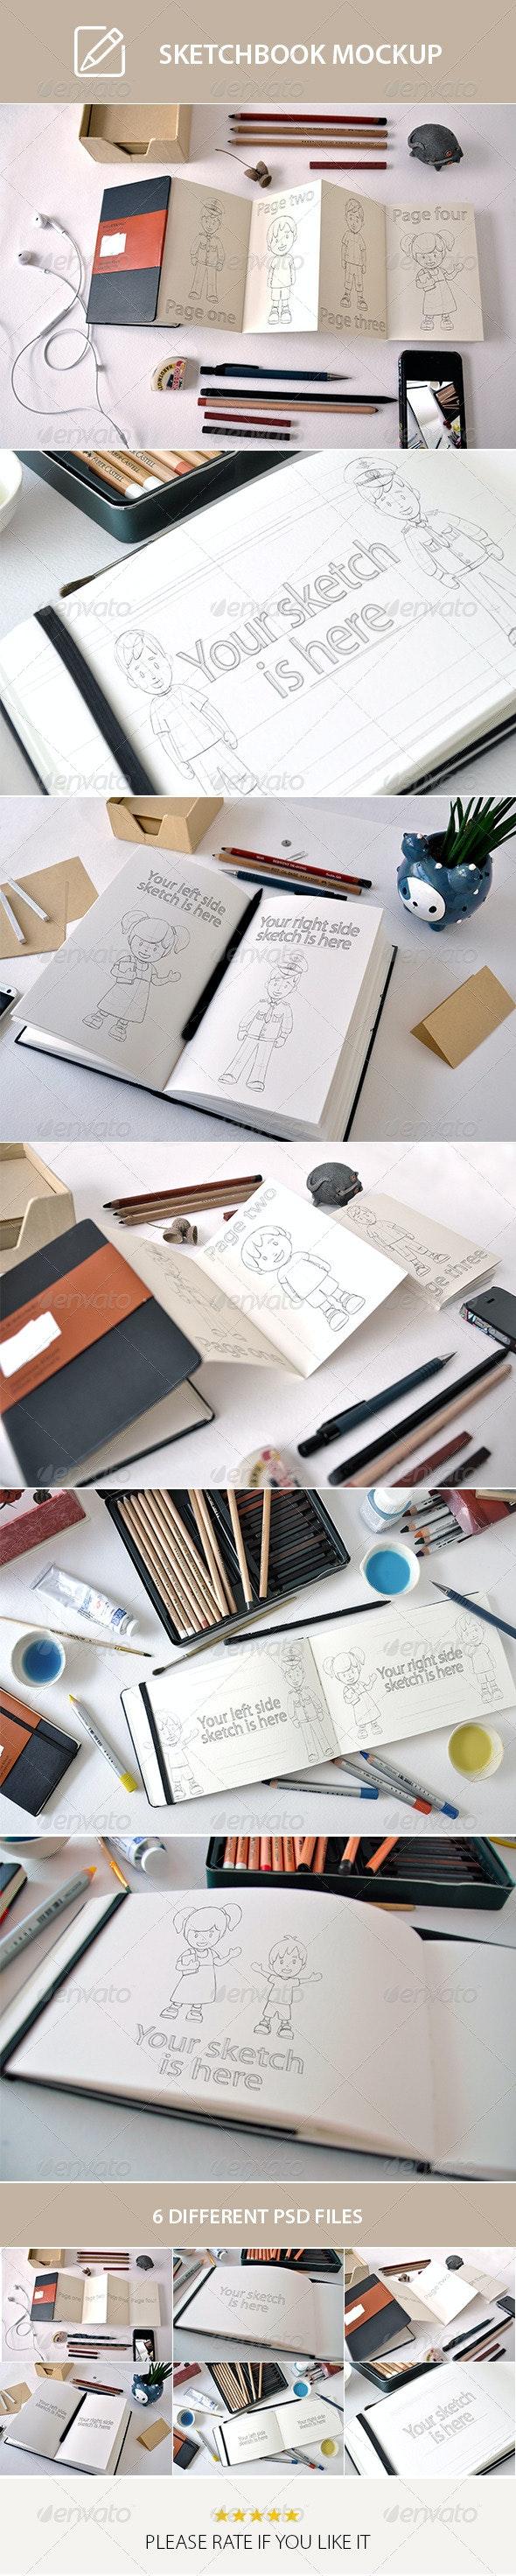 Scetchbook Mock-Up - Product Mock-Ups Graphics